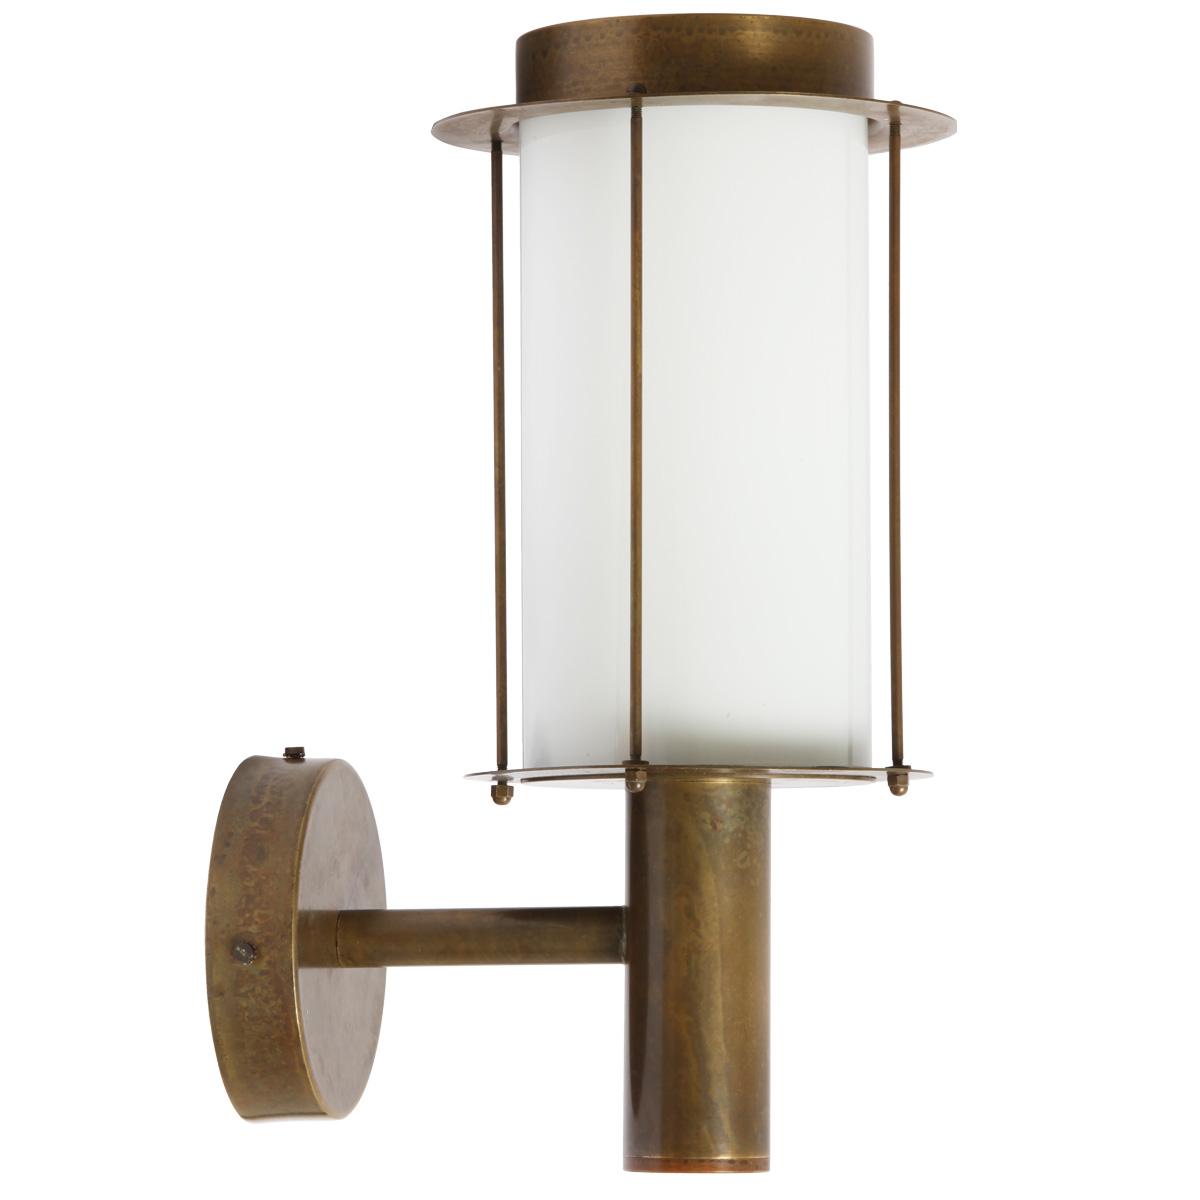 Image 1: Anbauleuchte Loggia Aus Messing 264.01.OO, Modell 1, Opalglas